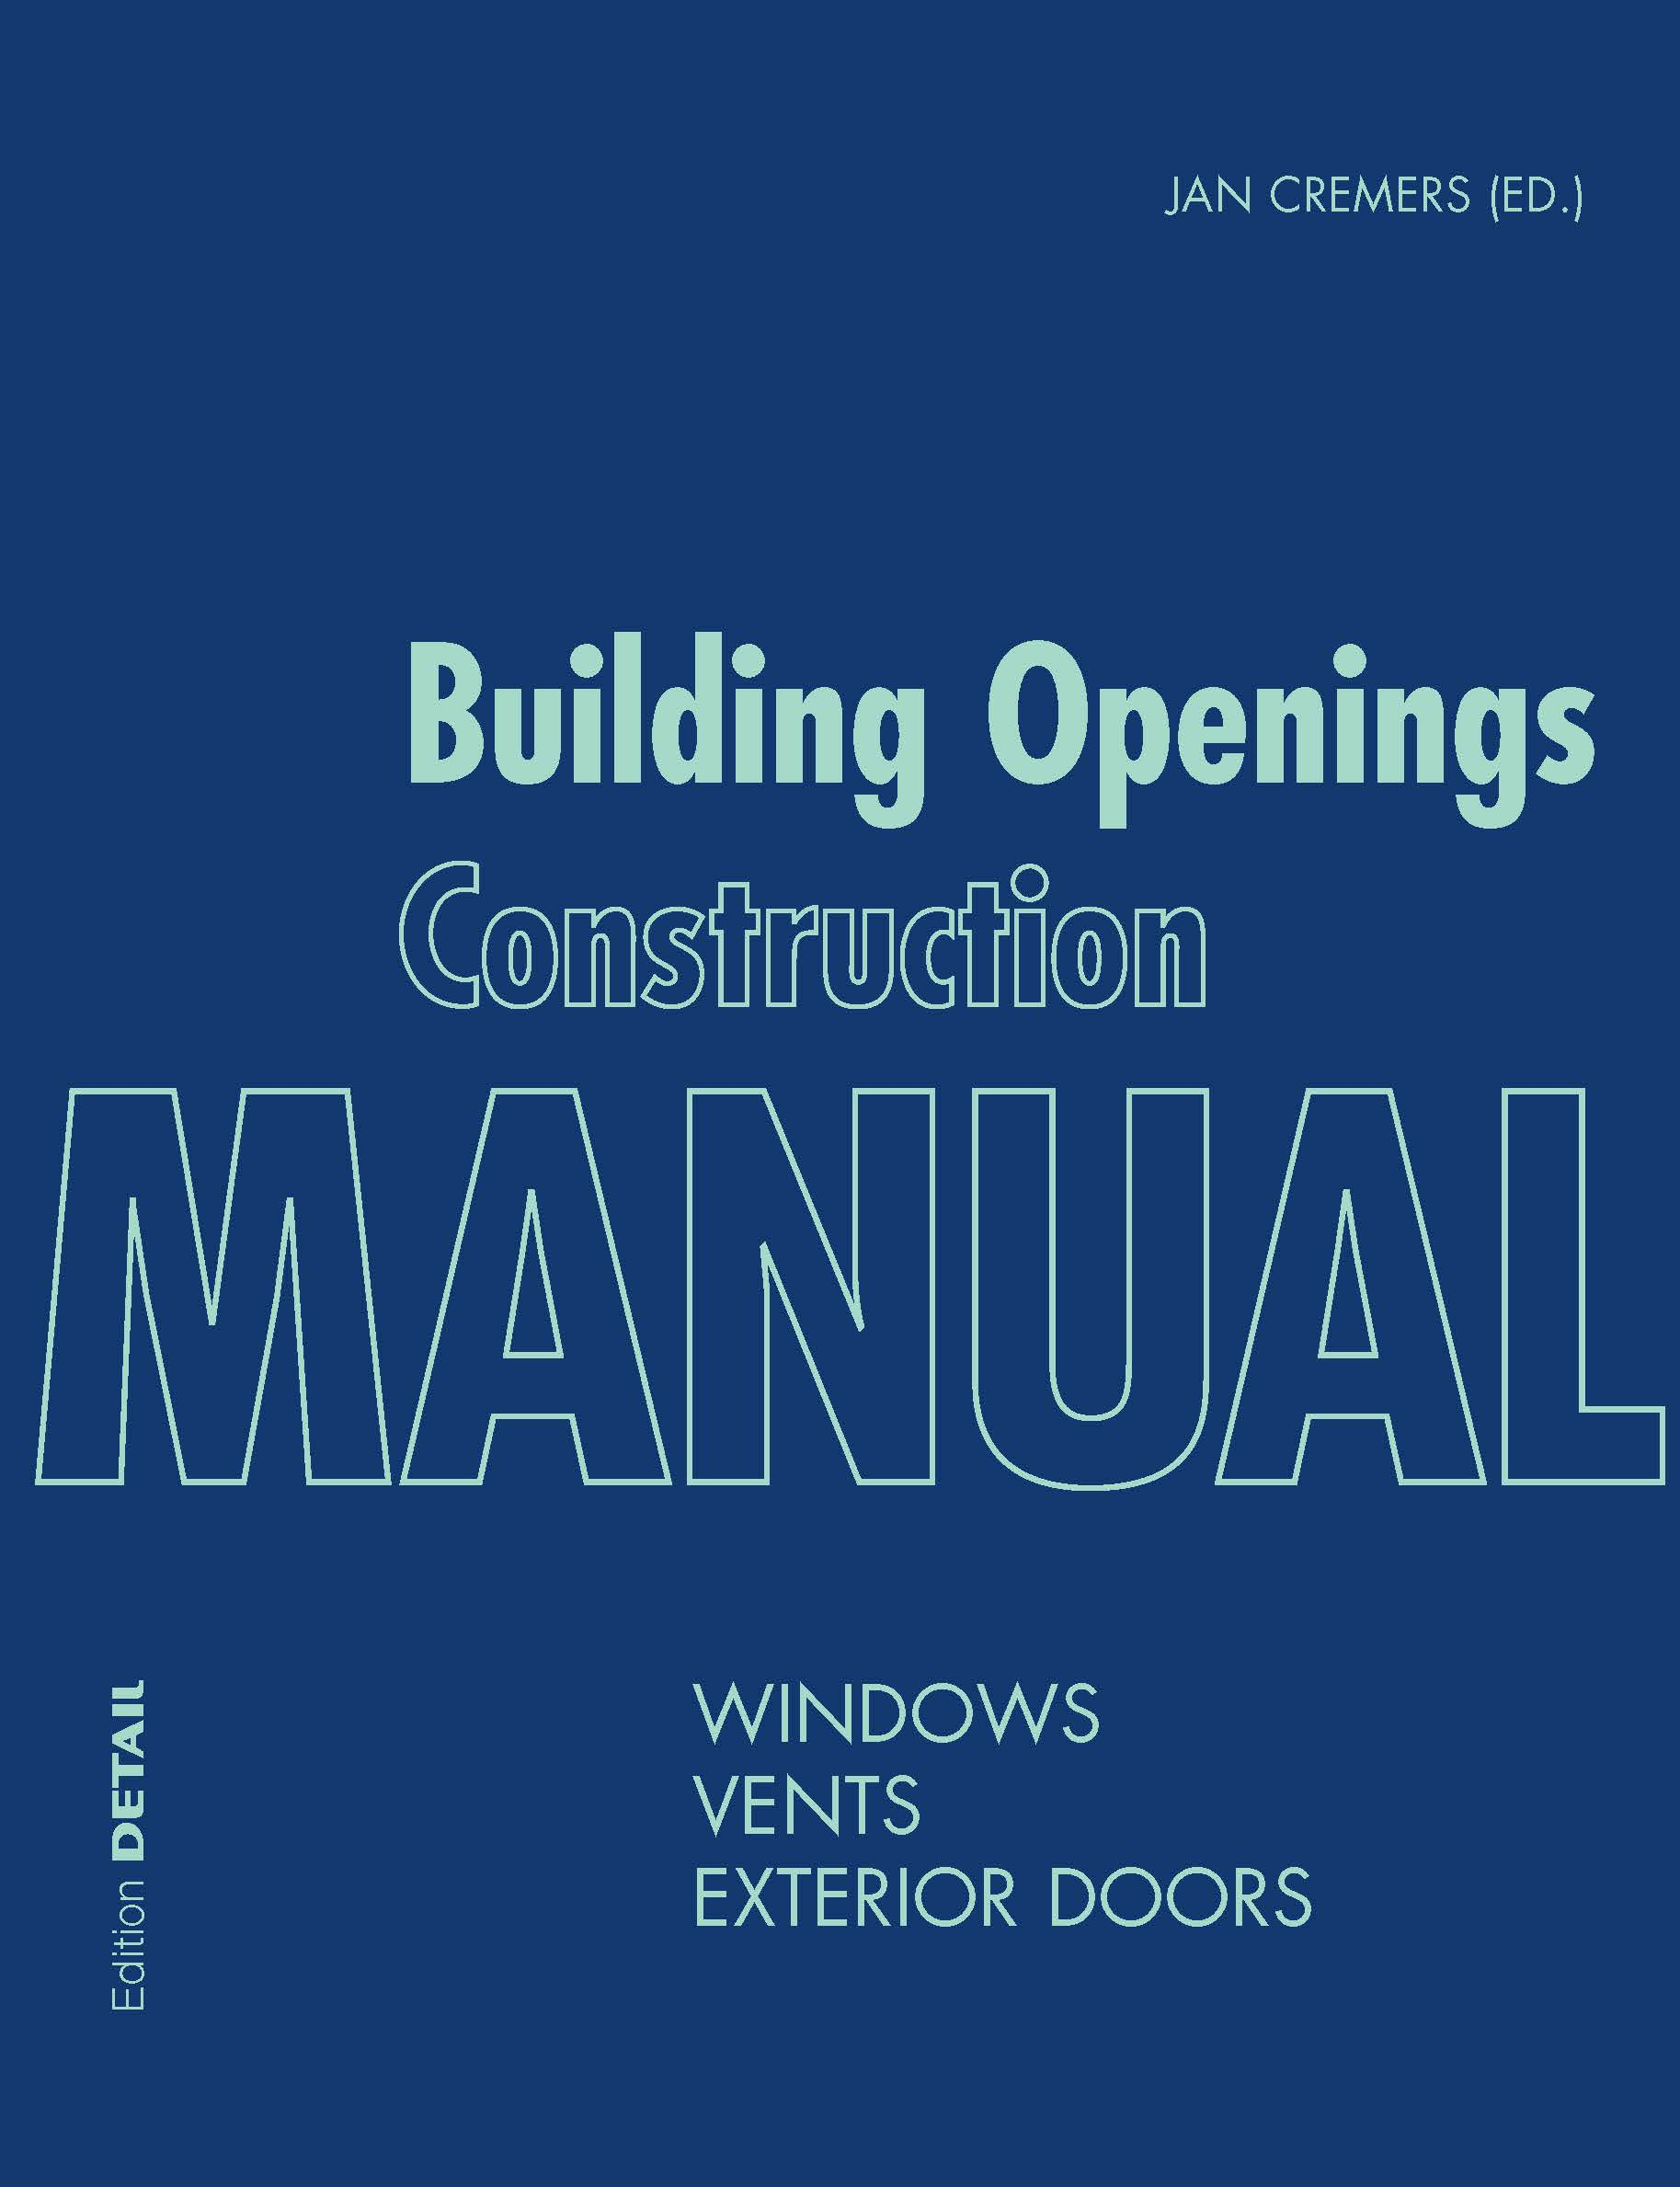 Pressebild Fassade Glass Construction Manual